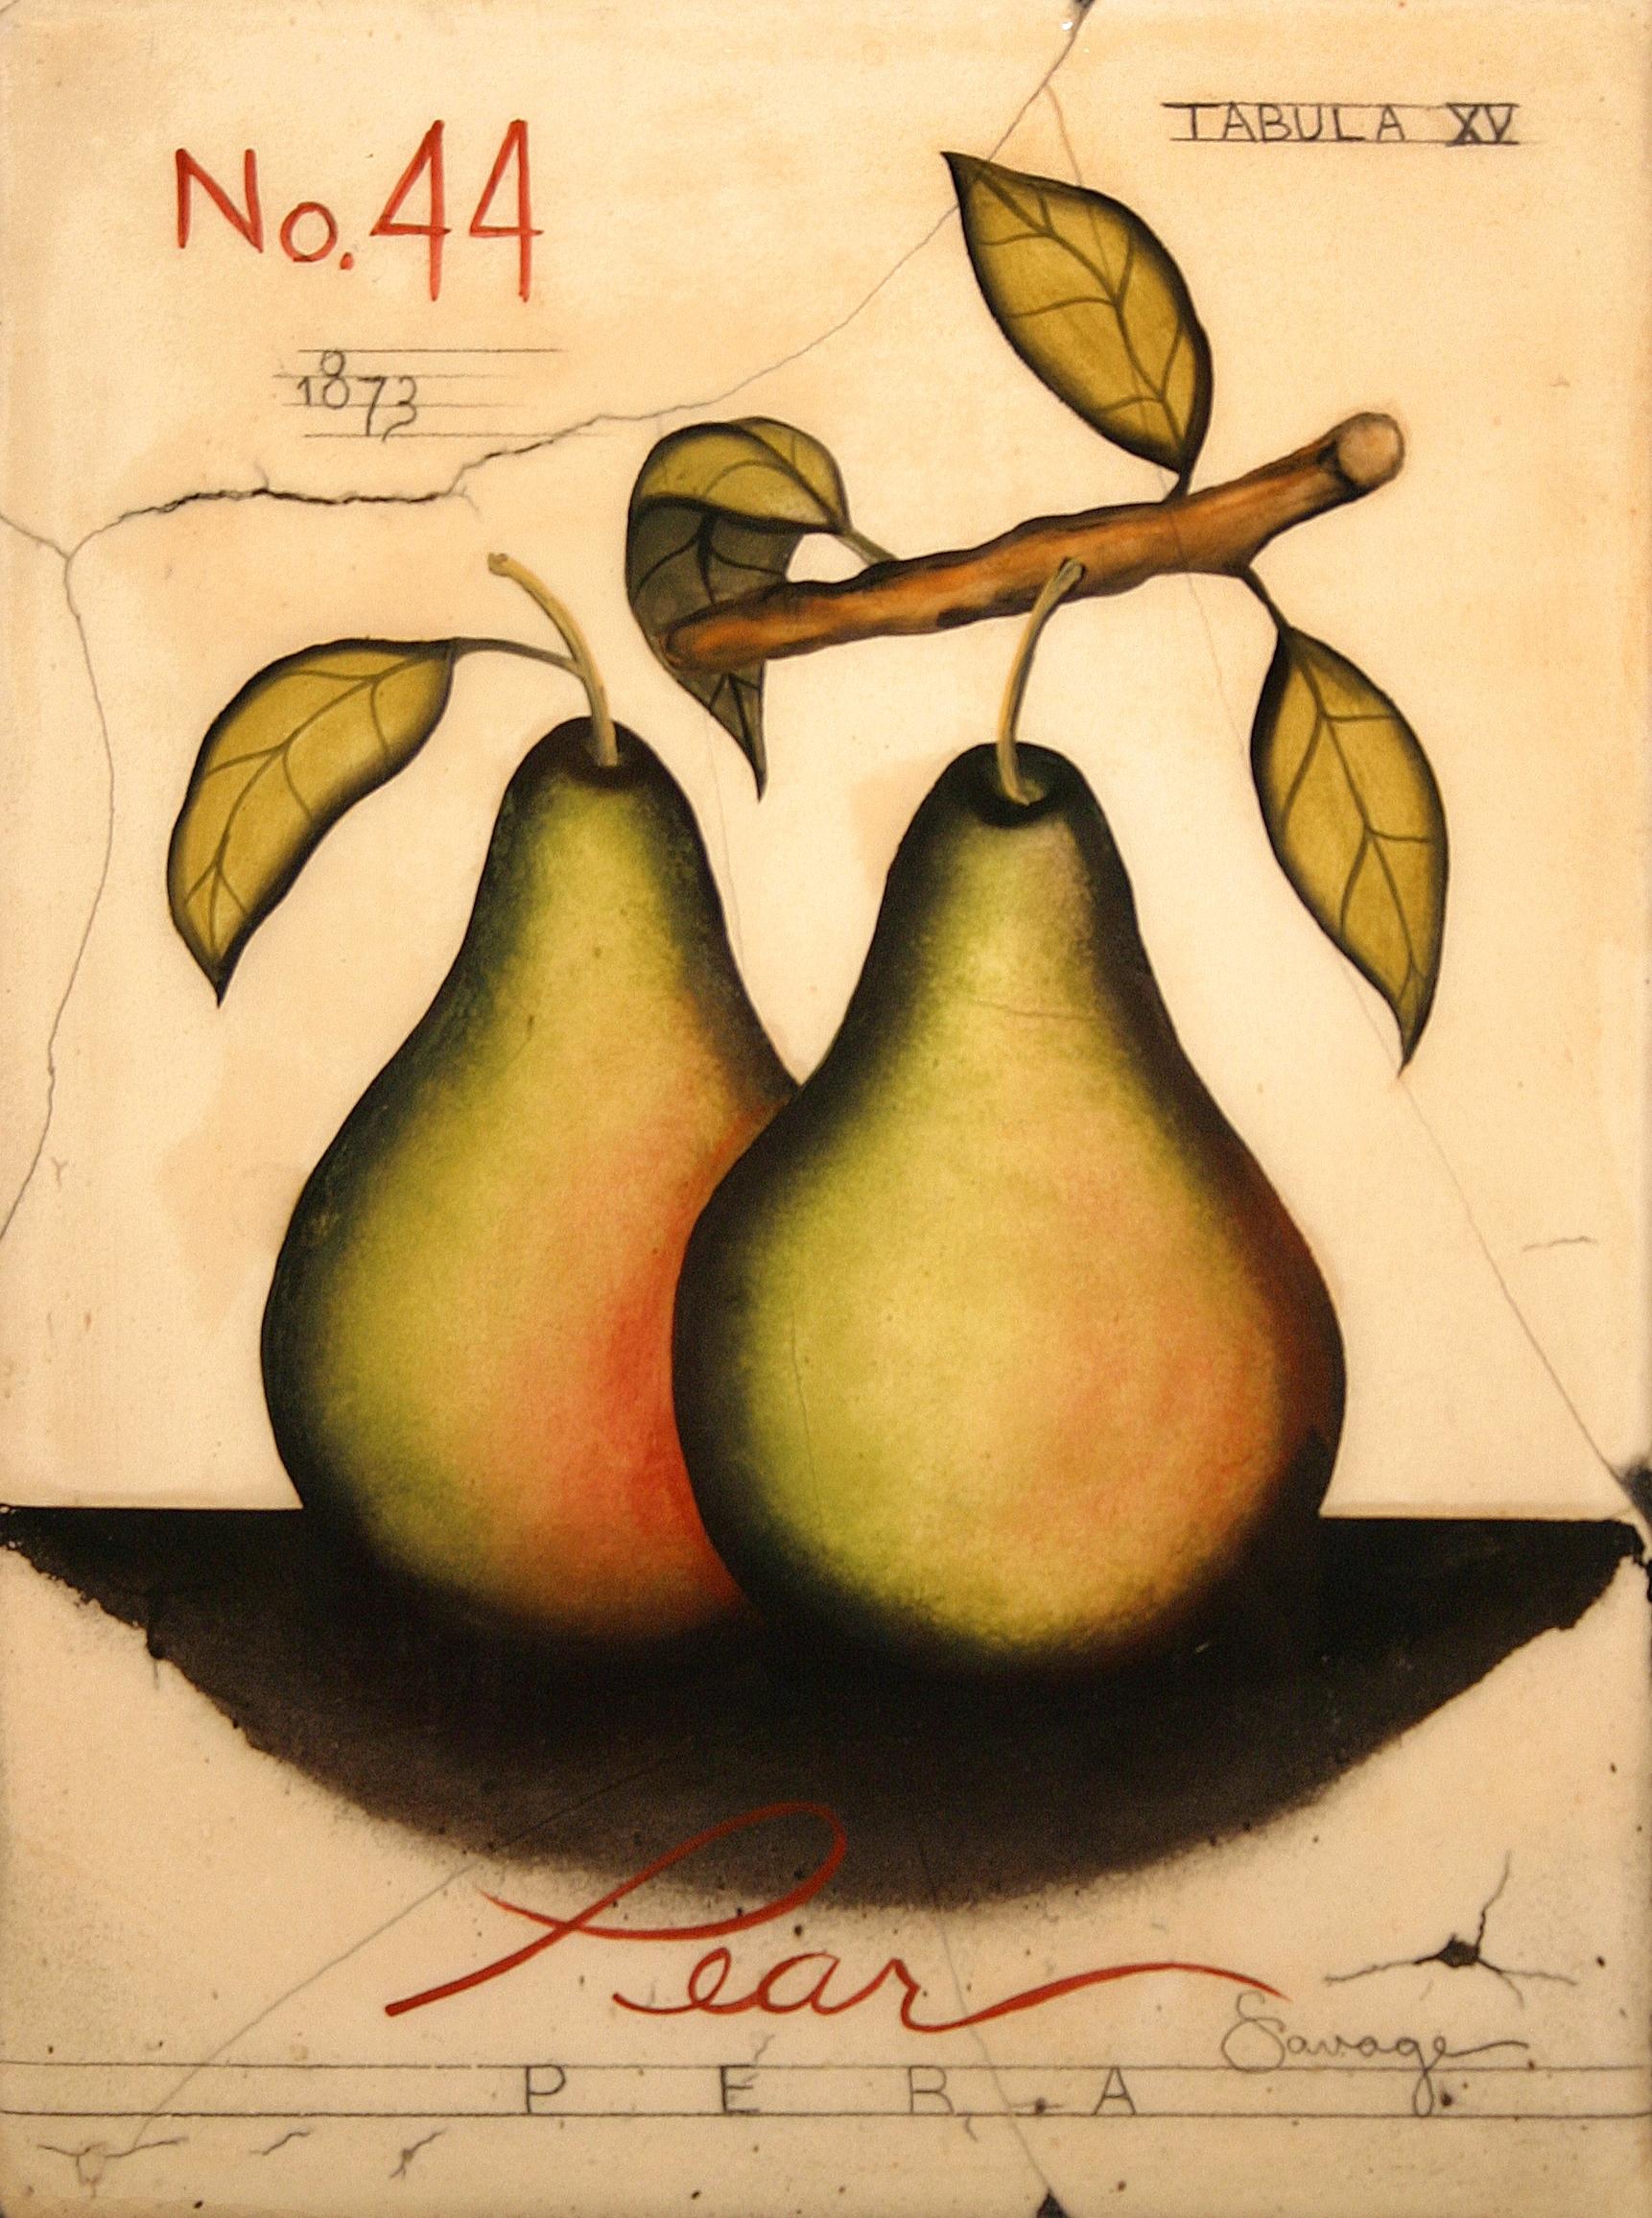 No. 44 Pear